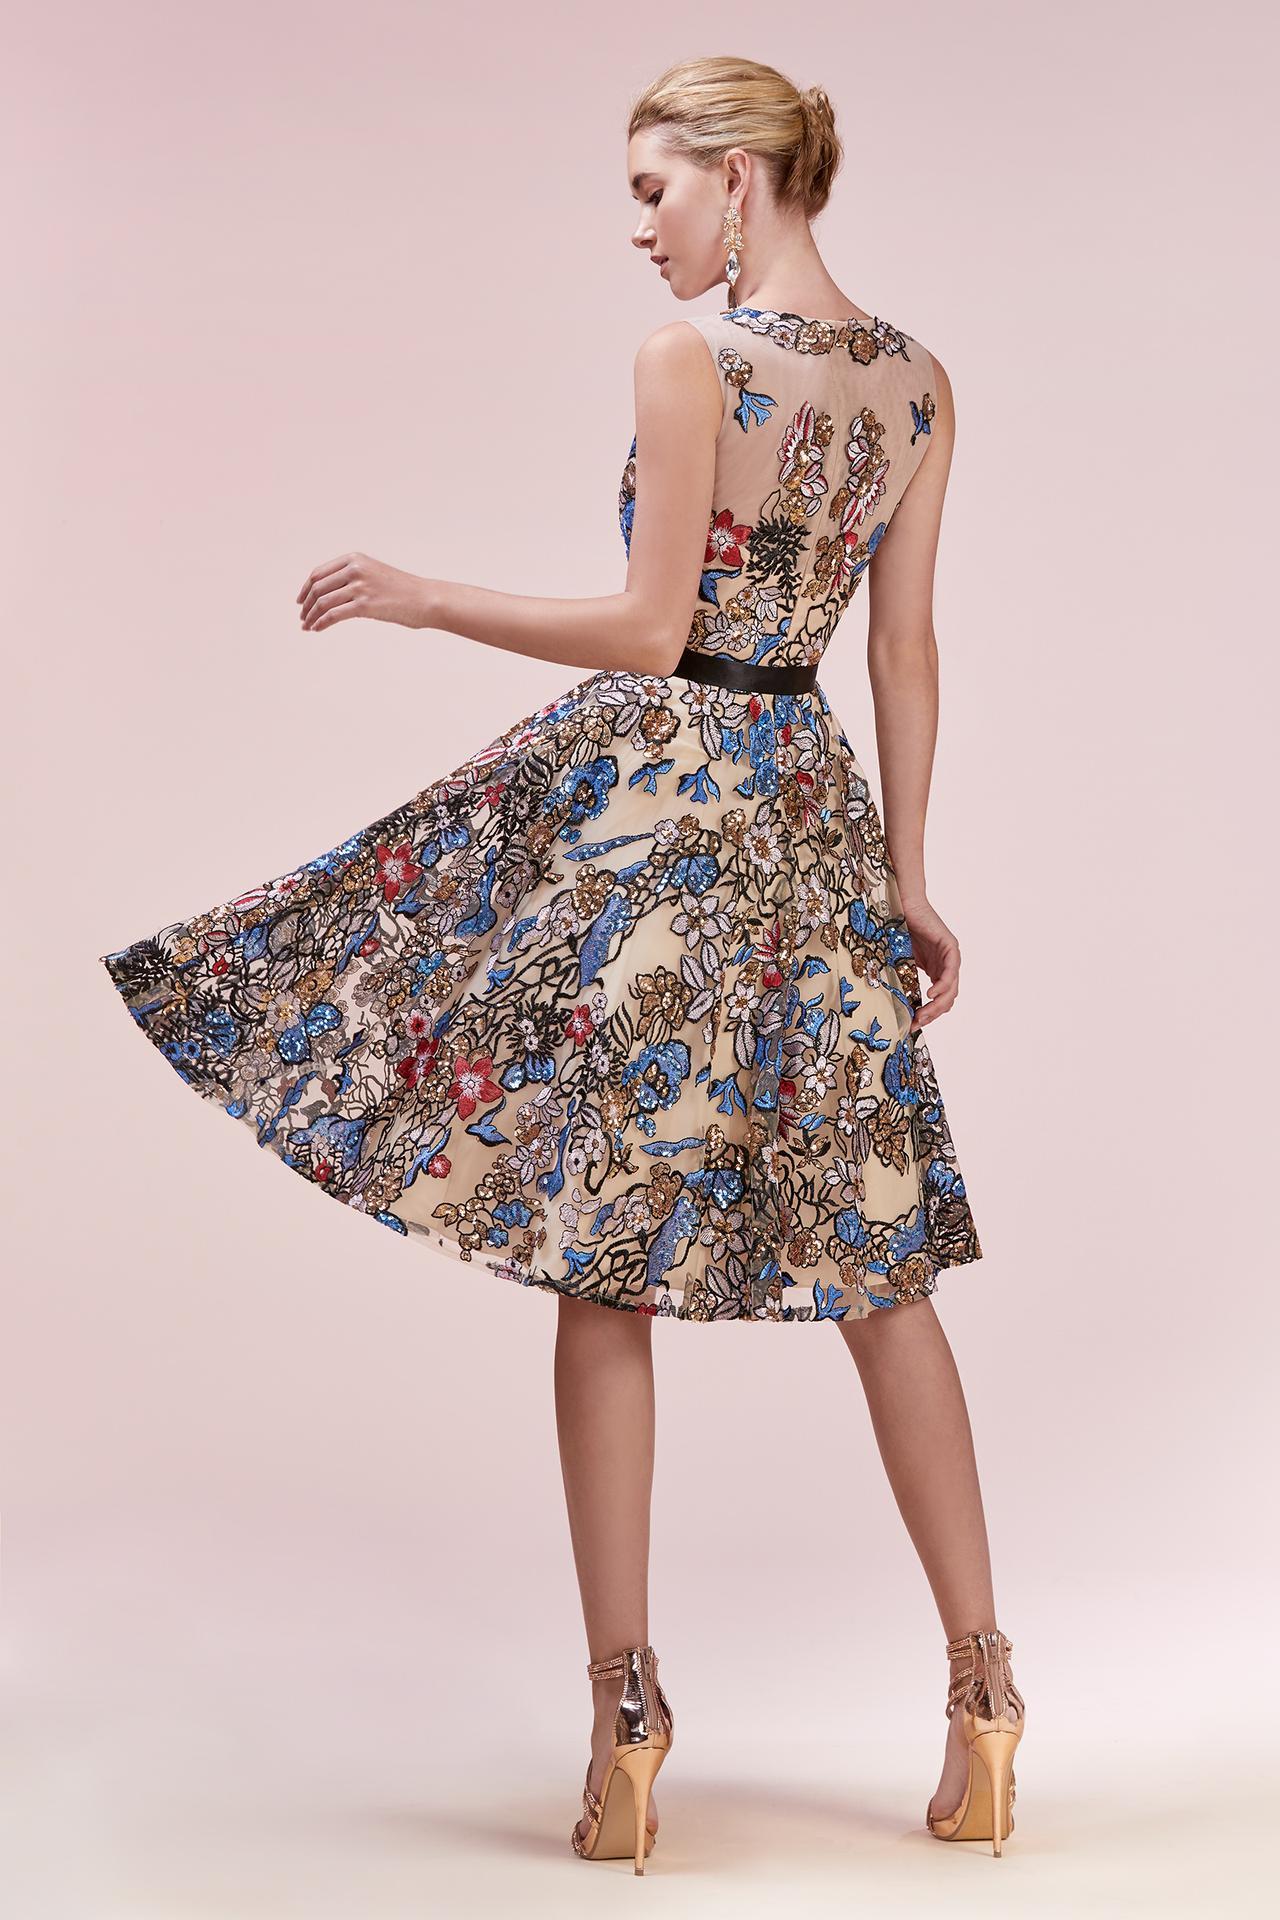 Nové spoločenské šaty :) - Obrázok č. 30